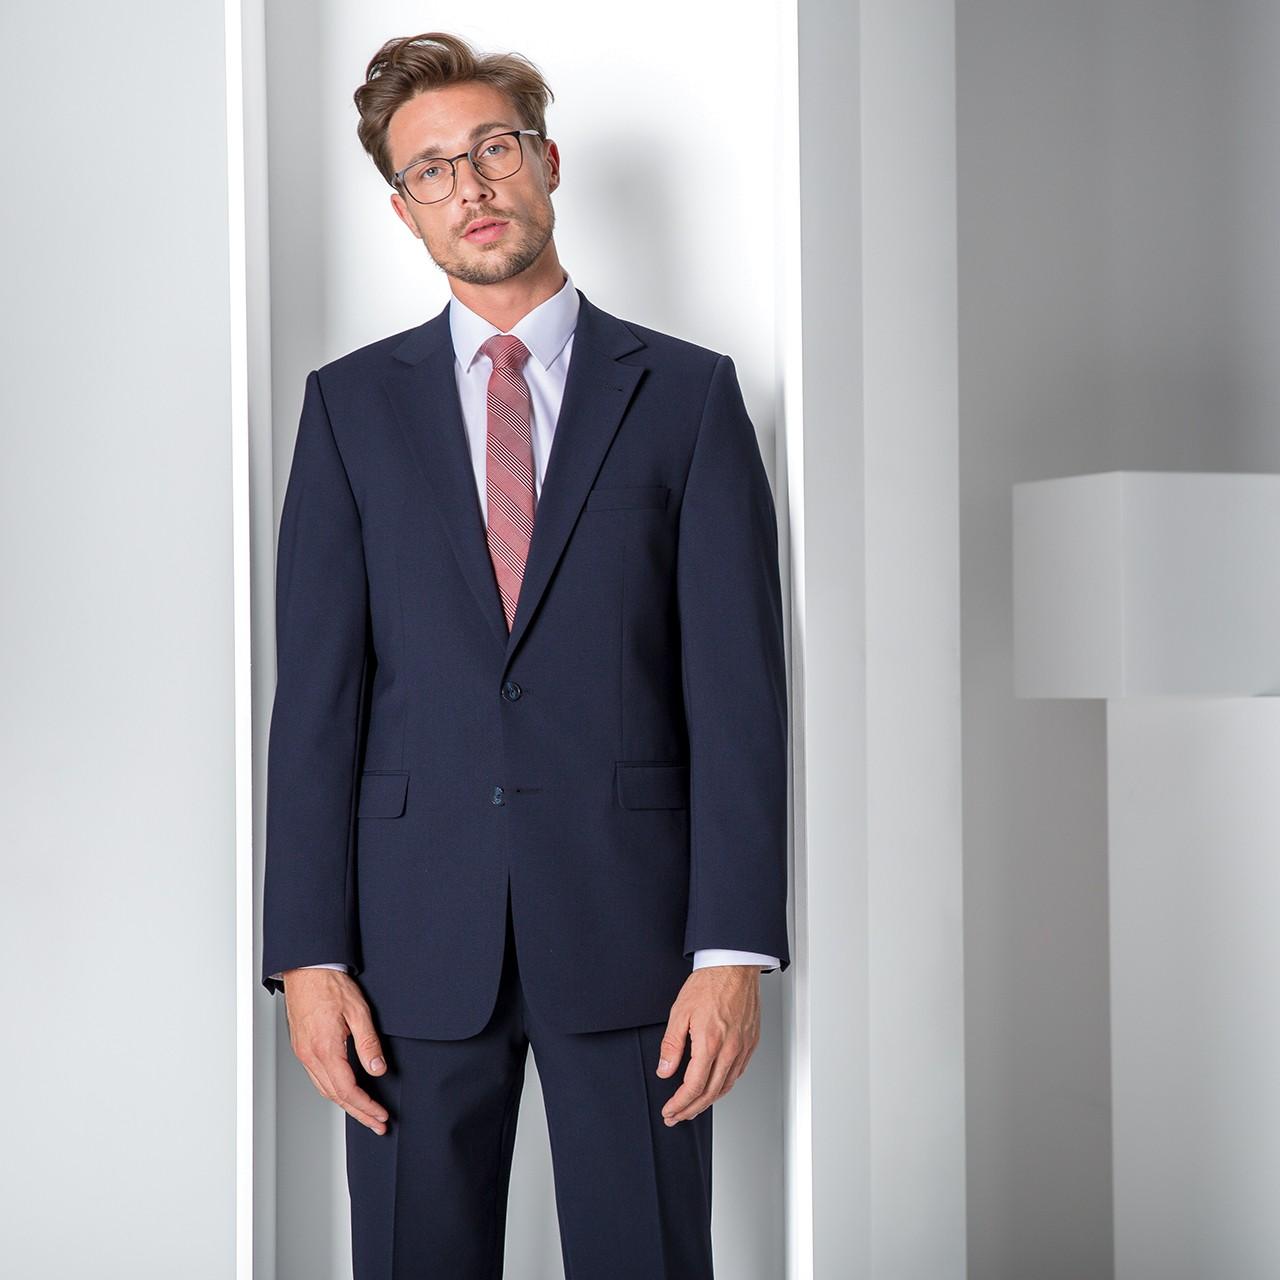 Premium Herren-Sakko Comfort Fit Greiff®   bedrucken, besticken, bedrucken lassen, besticken lassen, mit Logo  